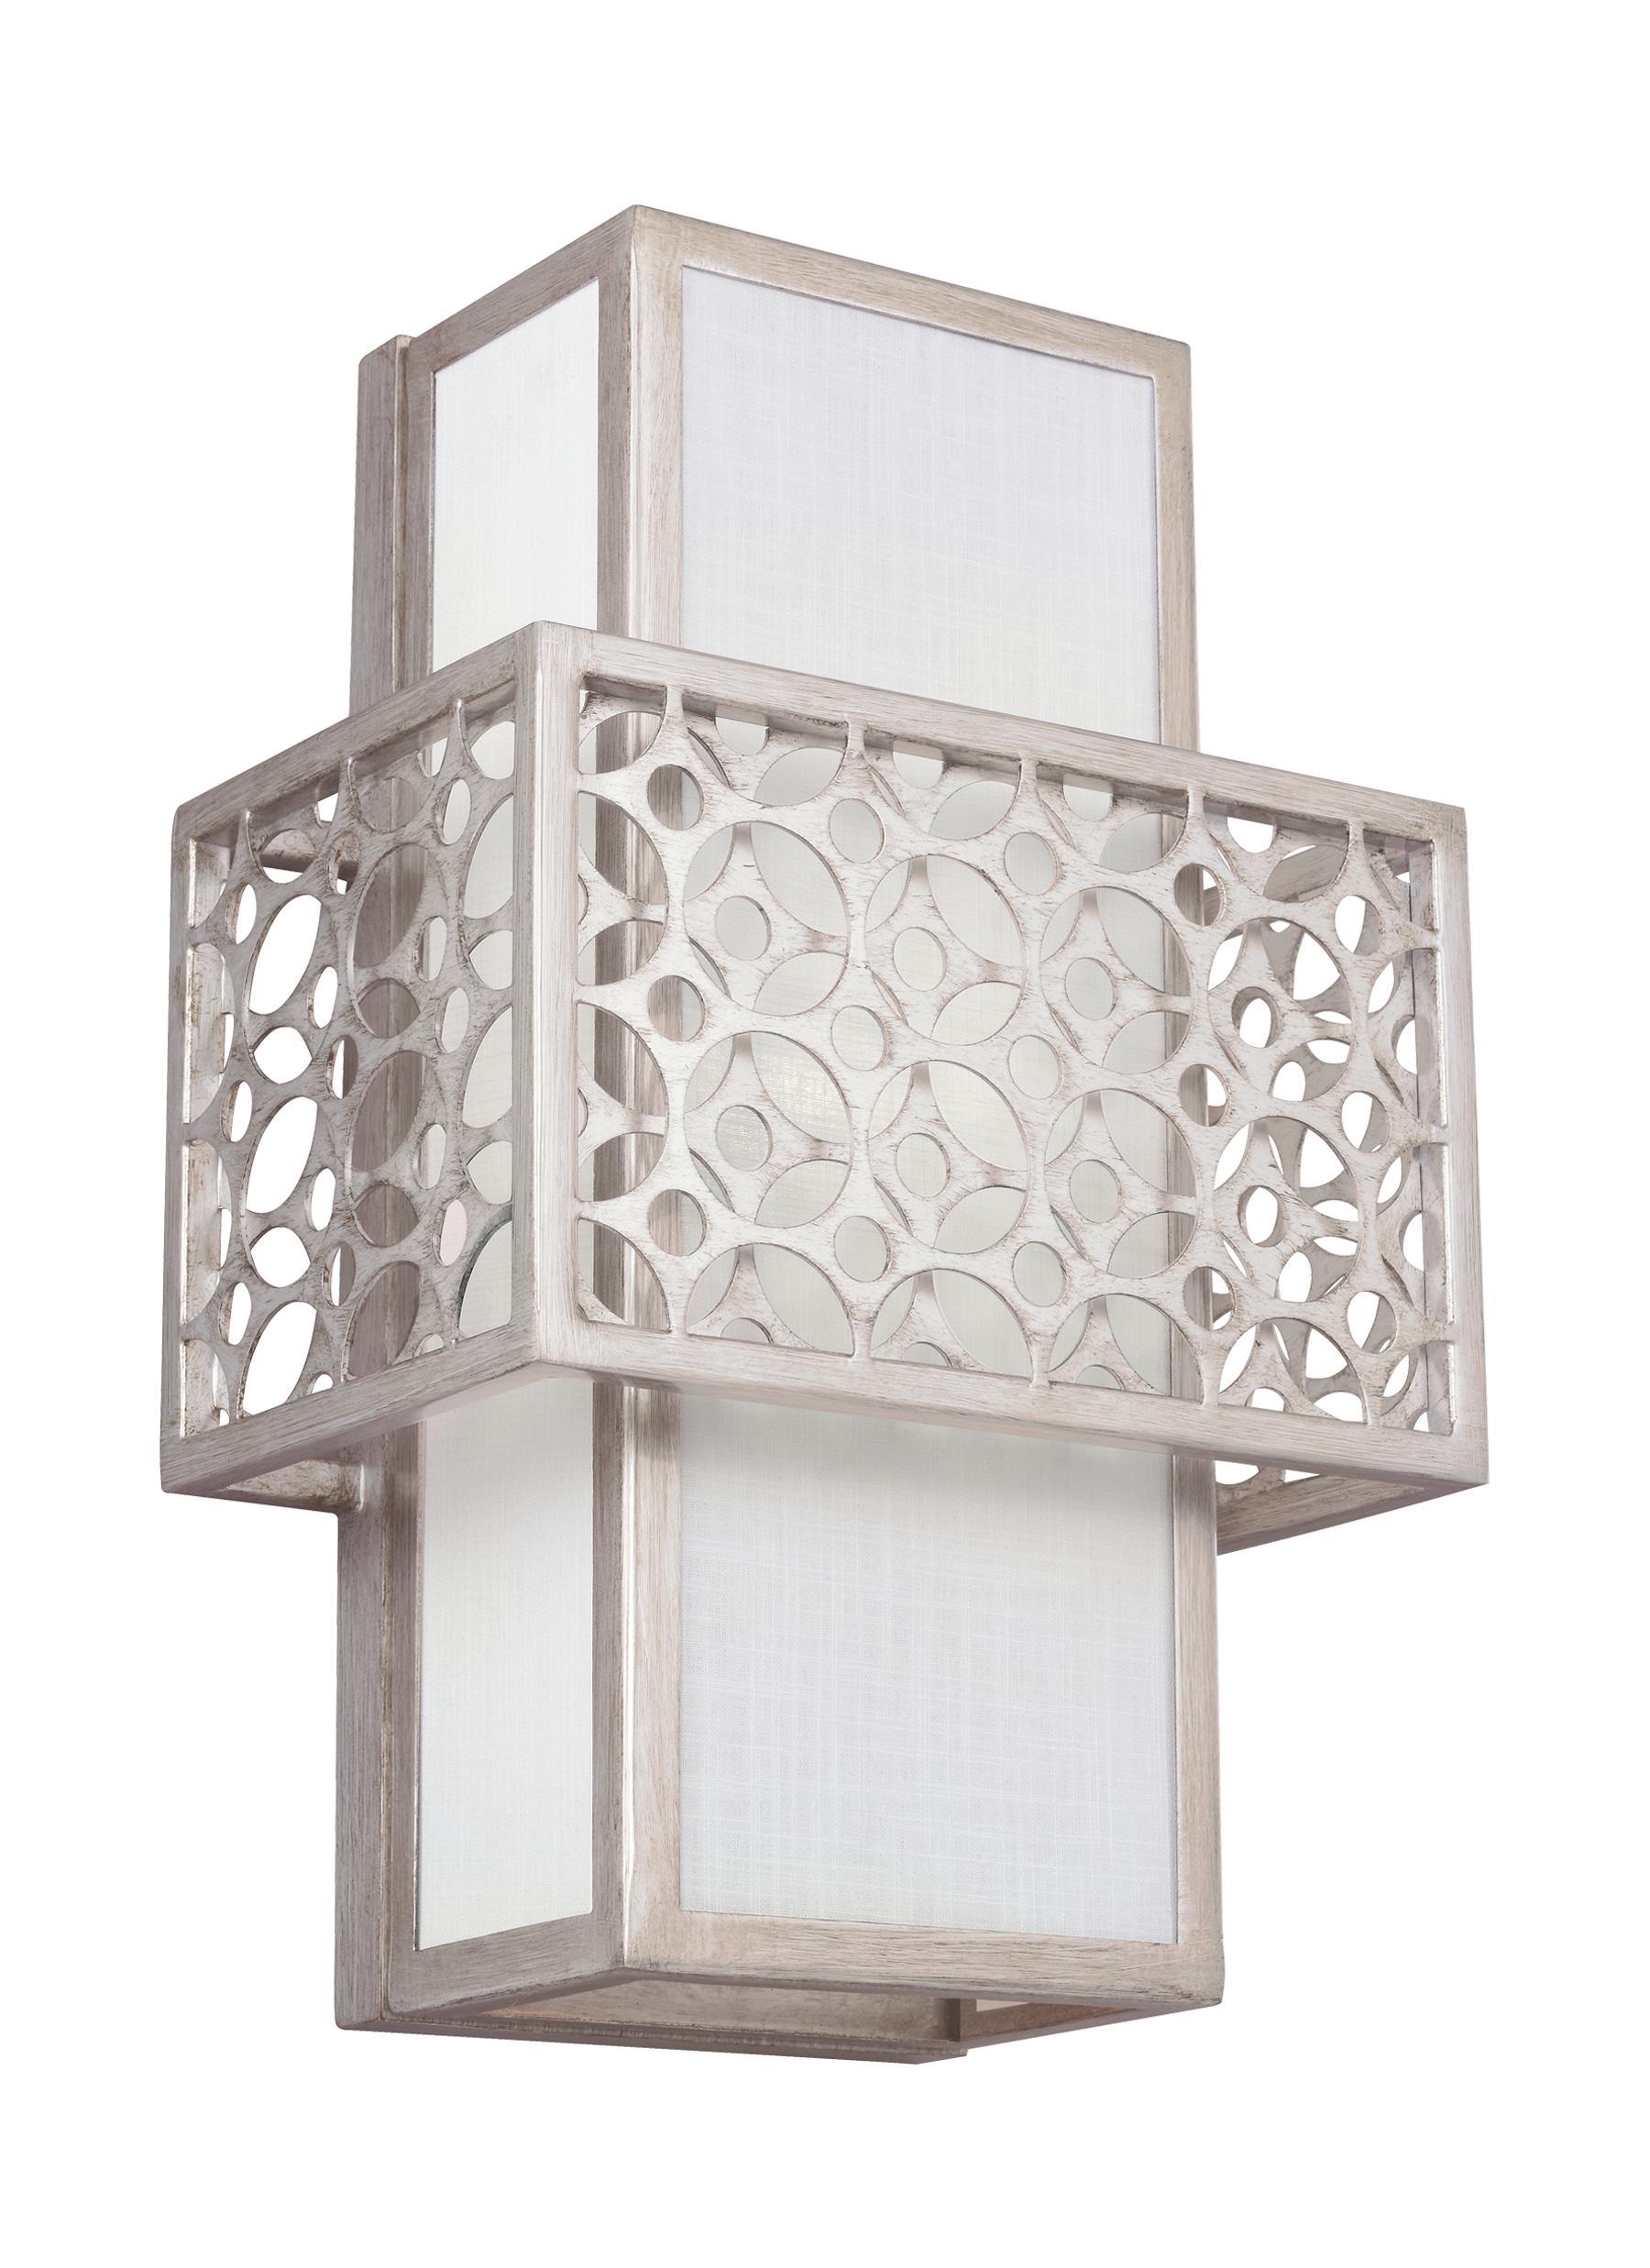 WB1819SRS,1 - Light Wall Sconce,Sunrise Silver for Geometric Wall Lamp  199fiz